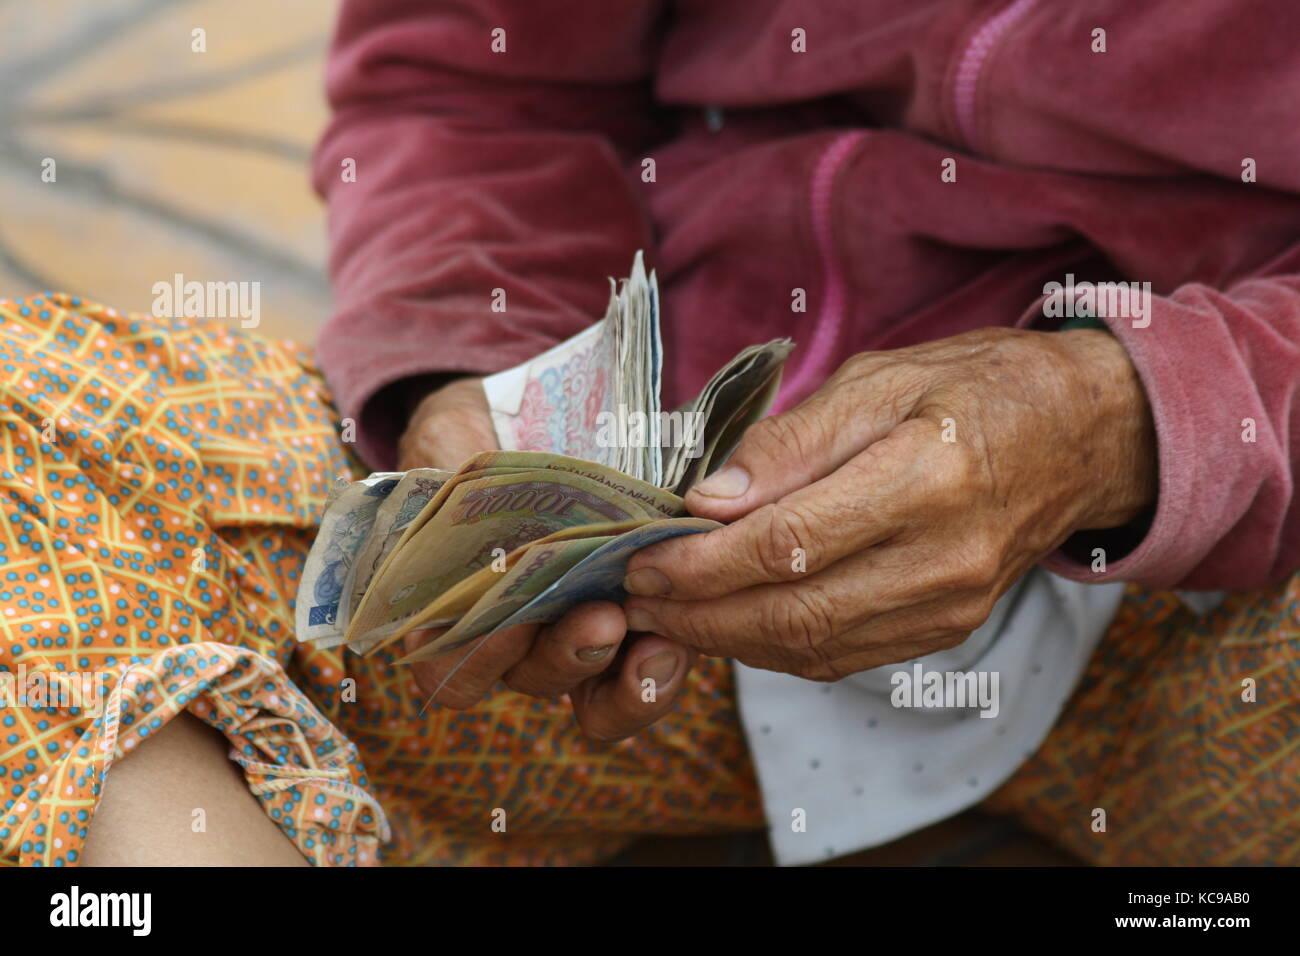 Hände die Geld sortieren und zählen in Asien - Hands sorting the money and counting in asia - Stock Image